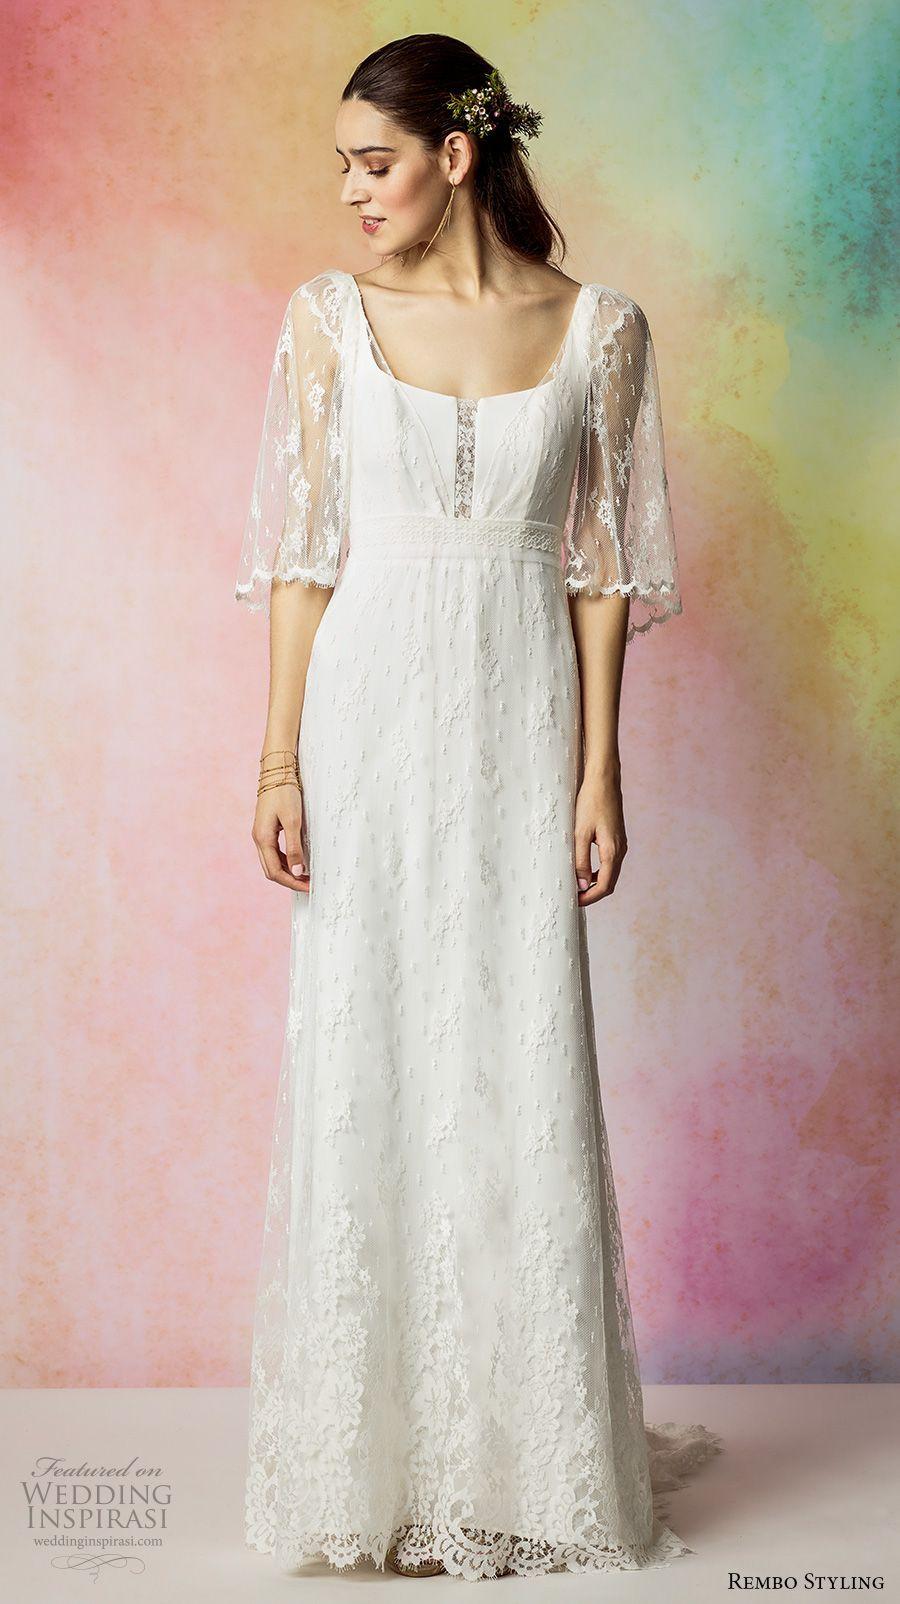 Rembo styling wedding dresses rembo styling wedding dress